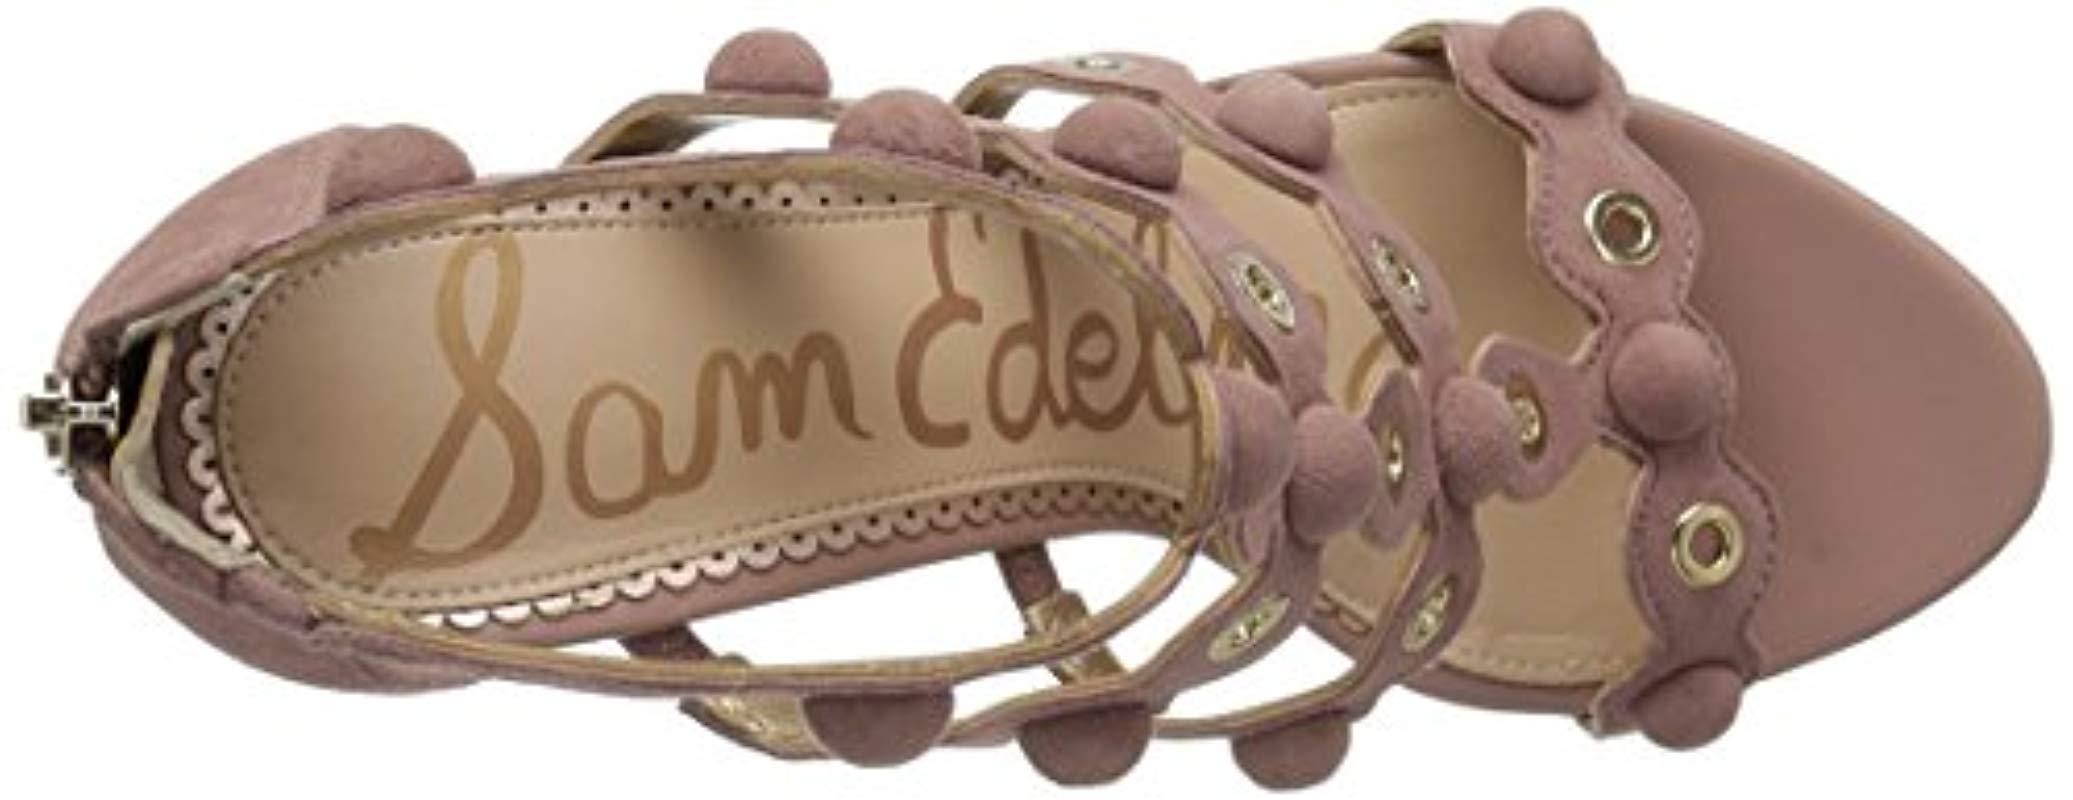 7db0b50a55e5 Sam Edelman - Multicolor Yuli Heeled Sandal